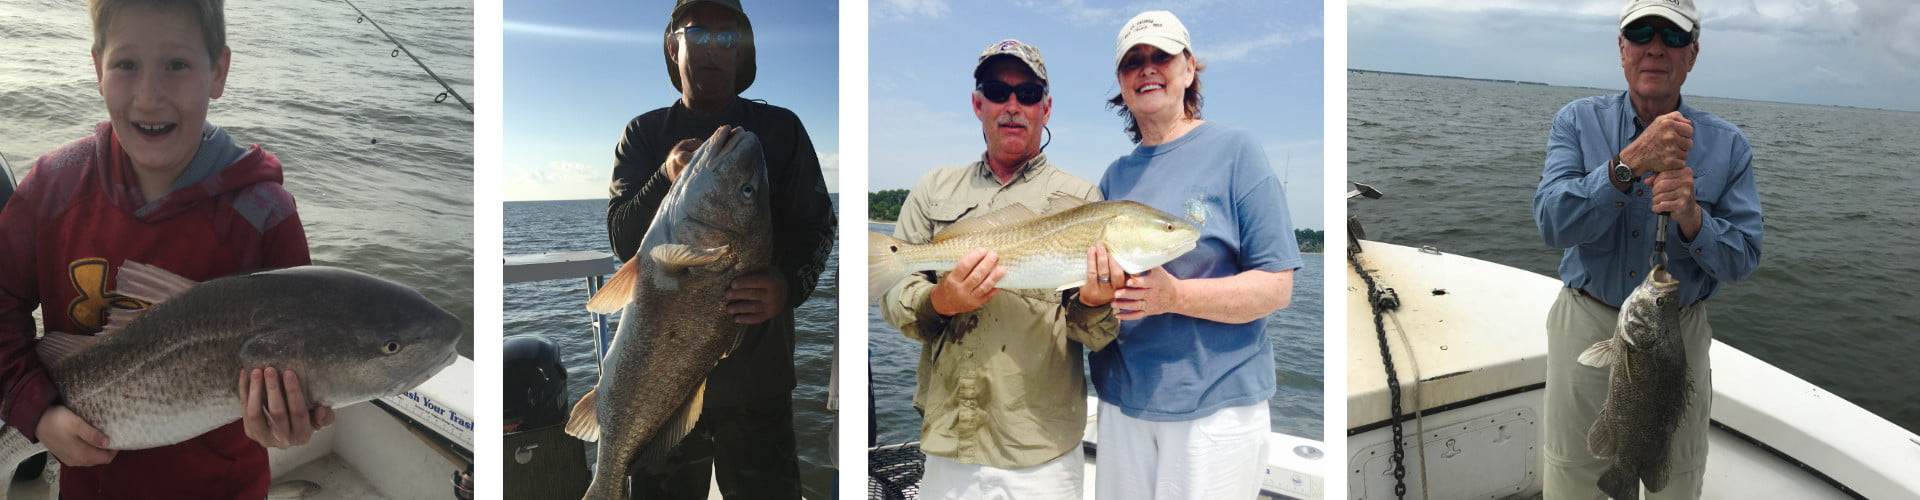 St George Island Fishing Charters - Apalachicola Fishing Charters